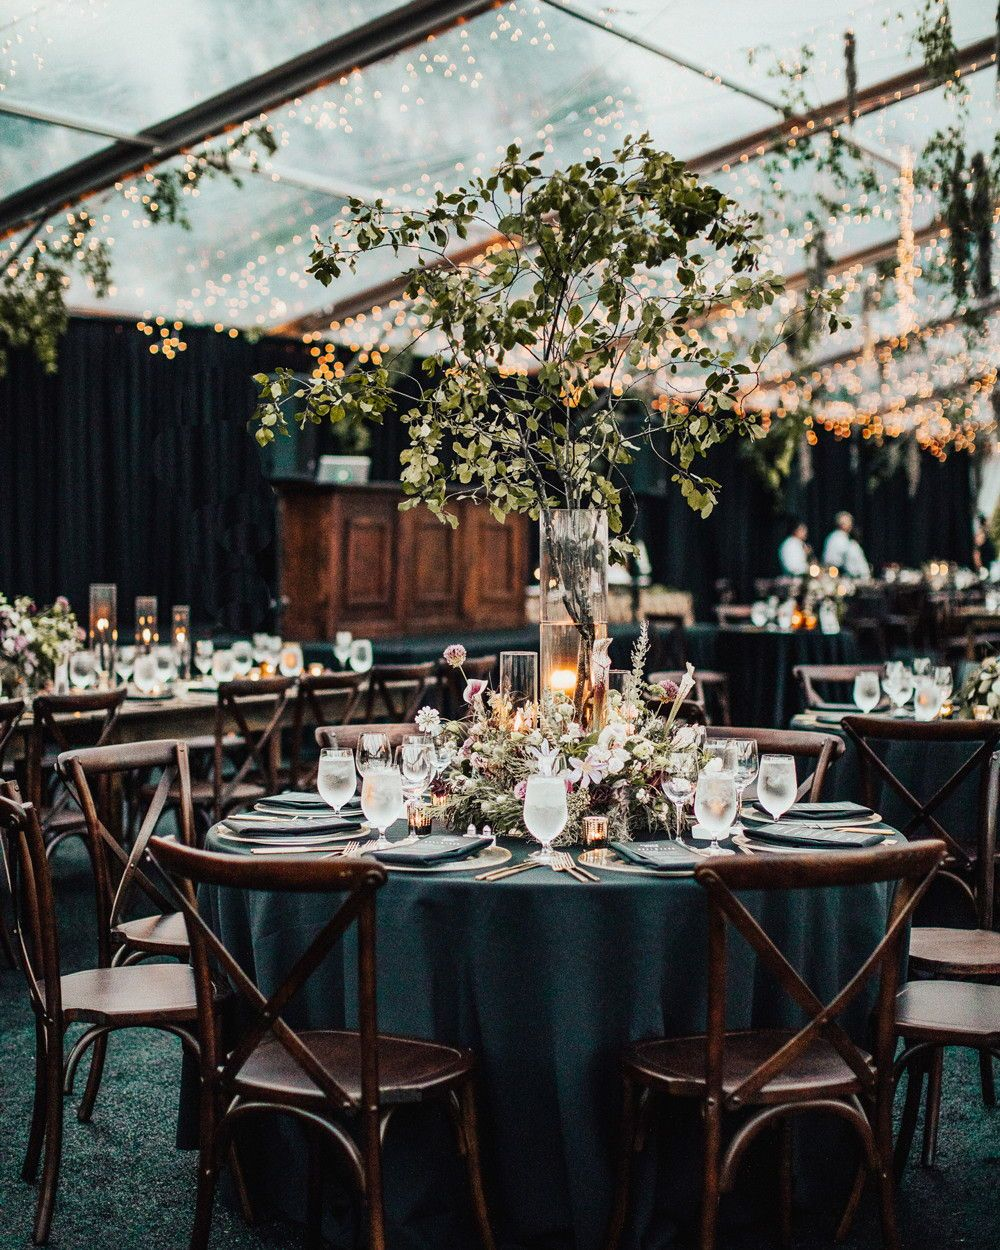 Vermont Wedding Flowers: A Moody, Gothic-Inspired Wedding In A Vermont Birch Grove